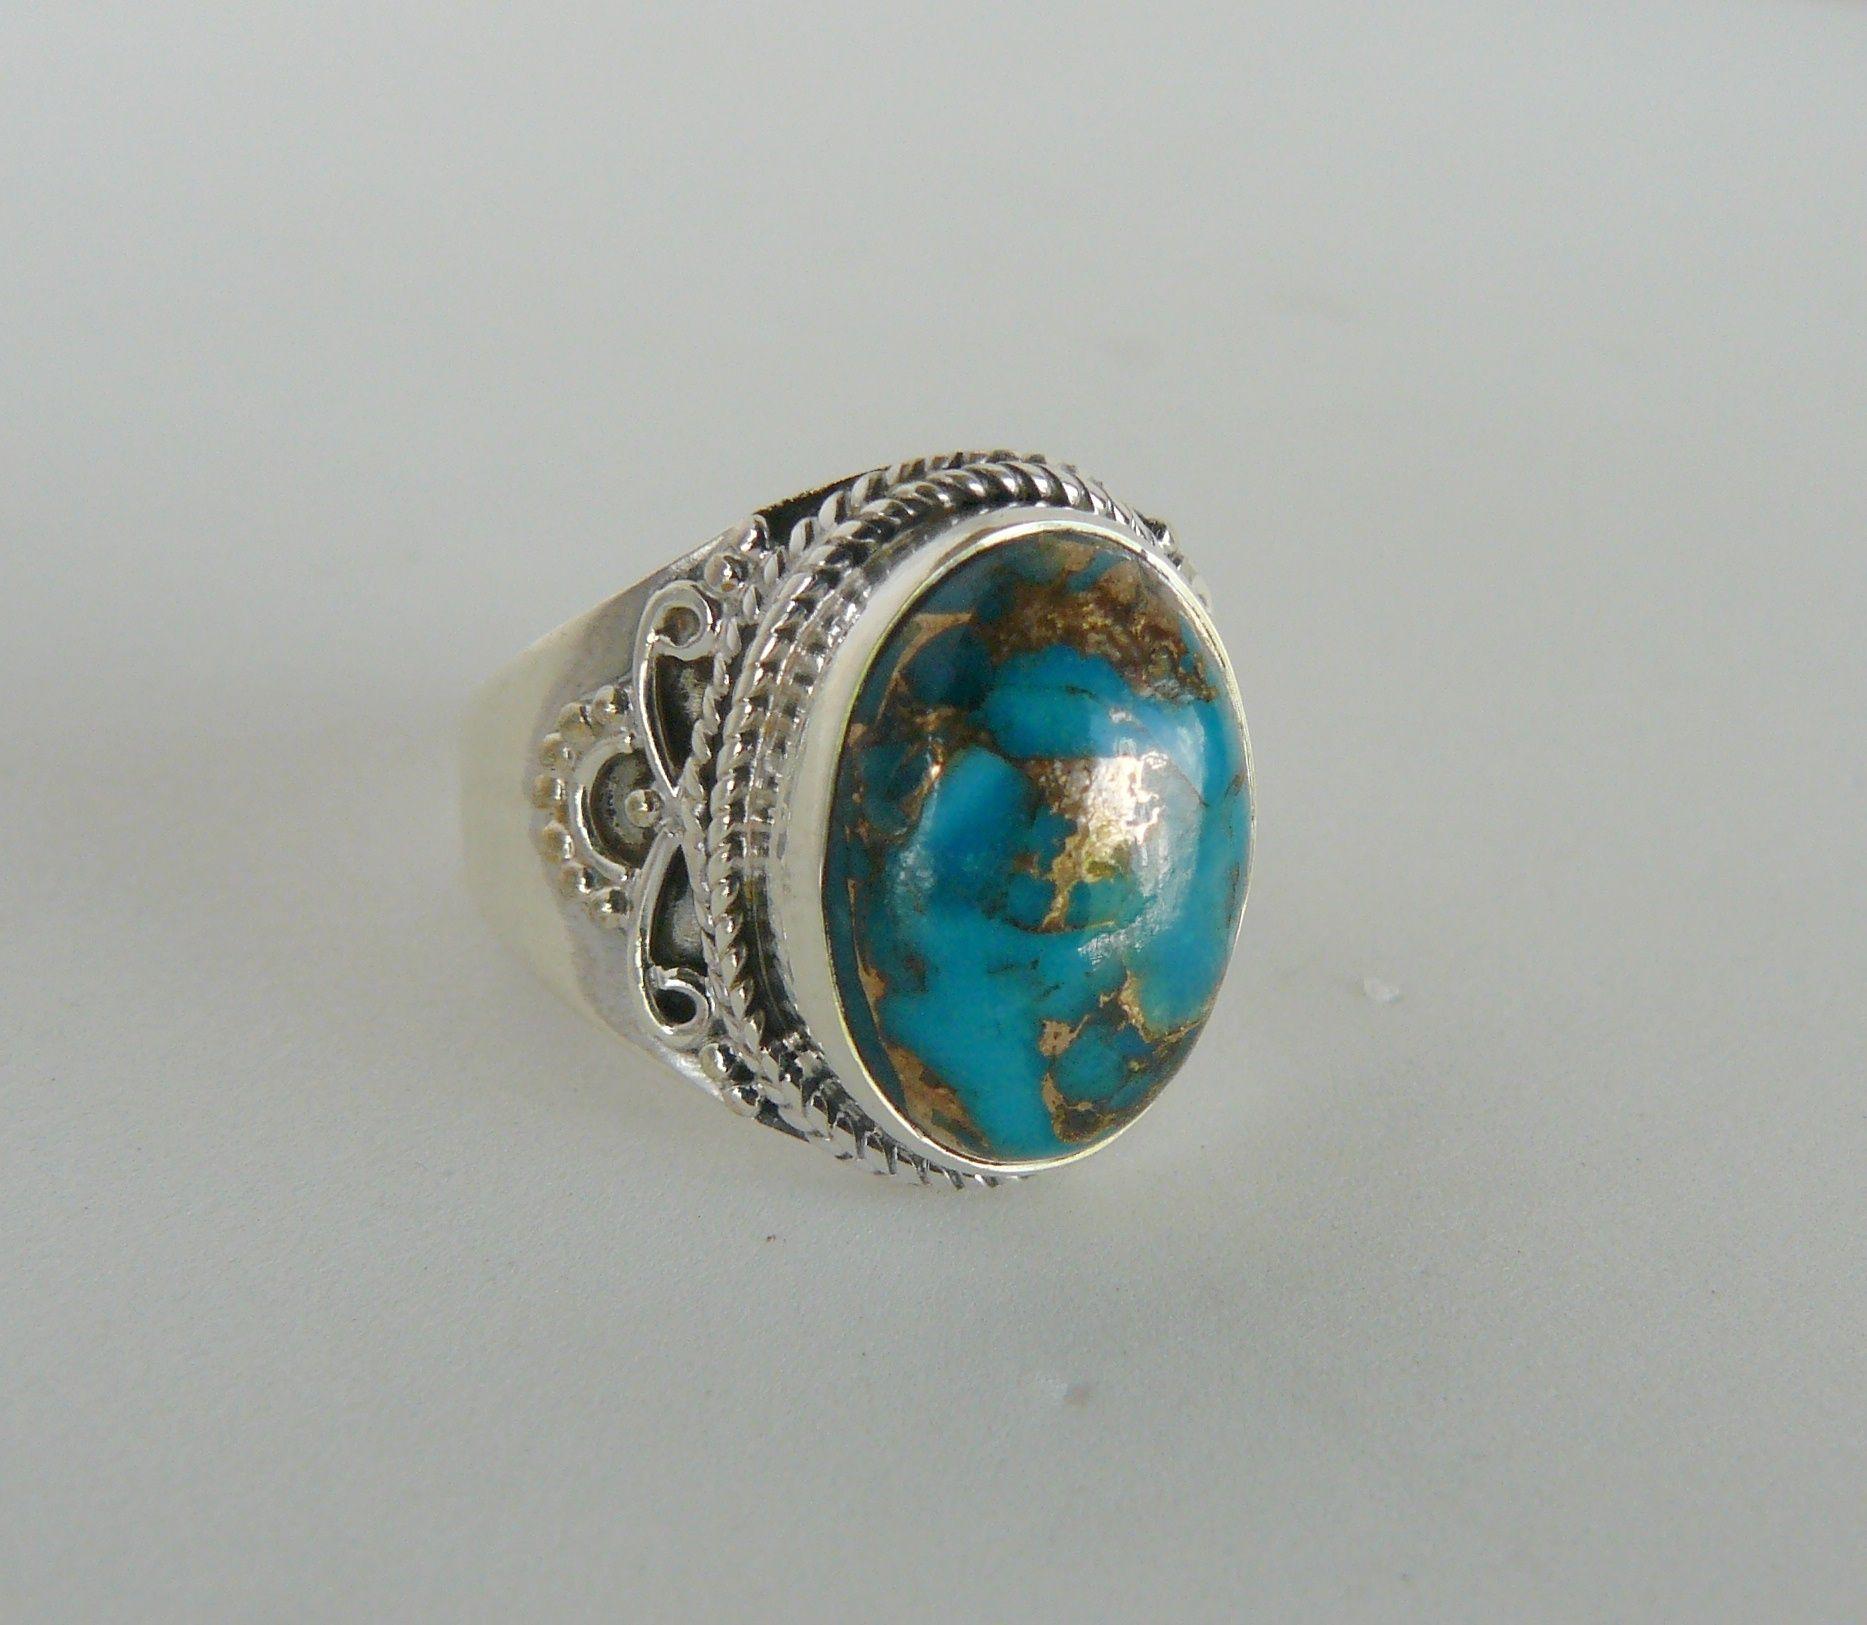 Anillos de Plata 925 de India con Piedra Blue Cooper